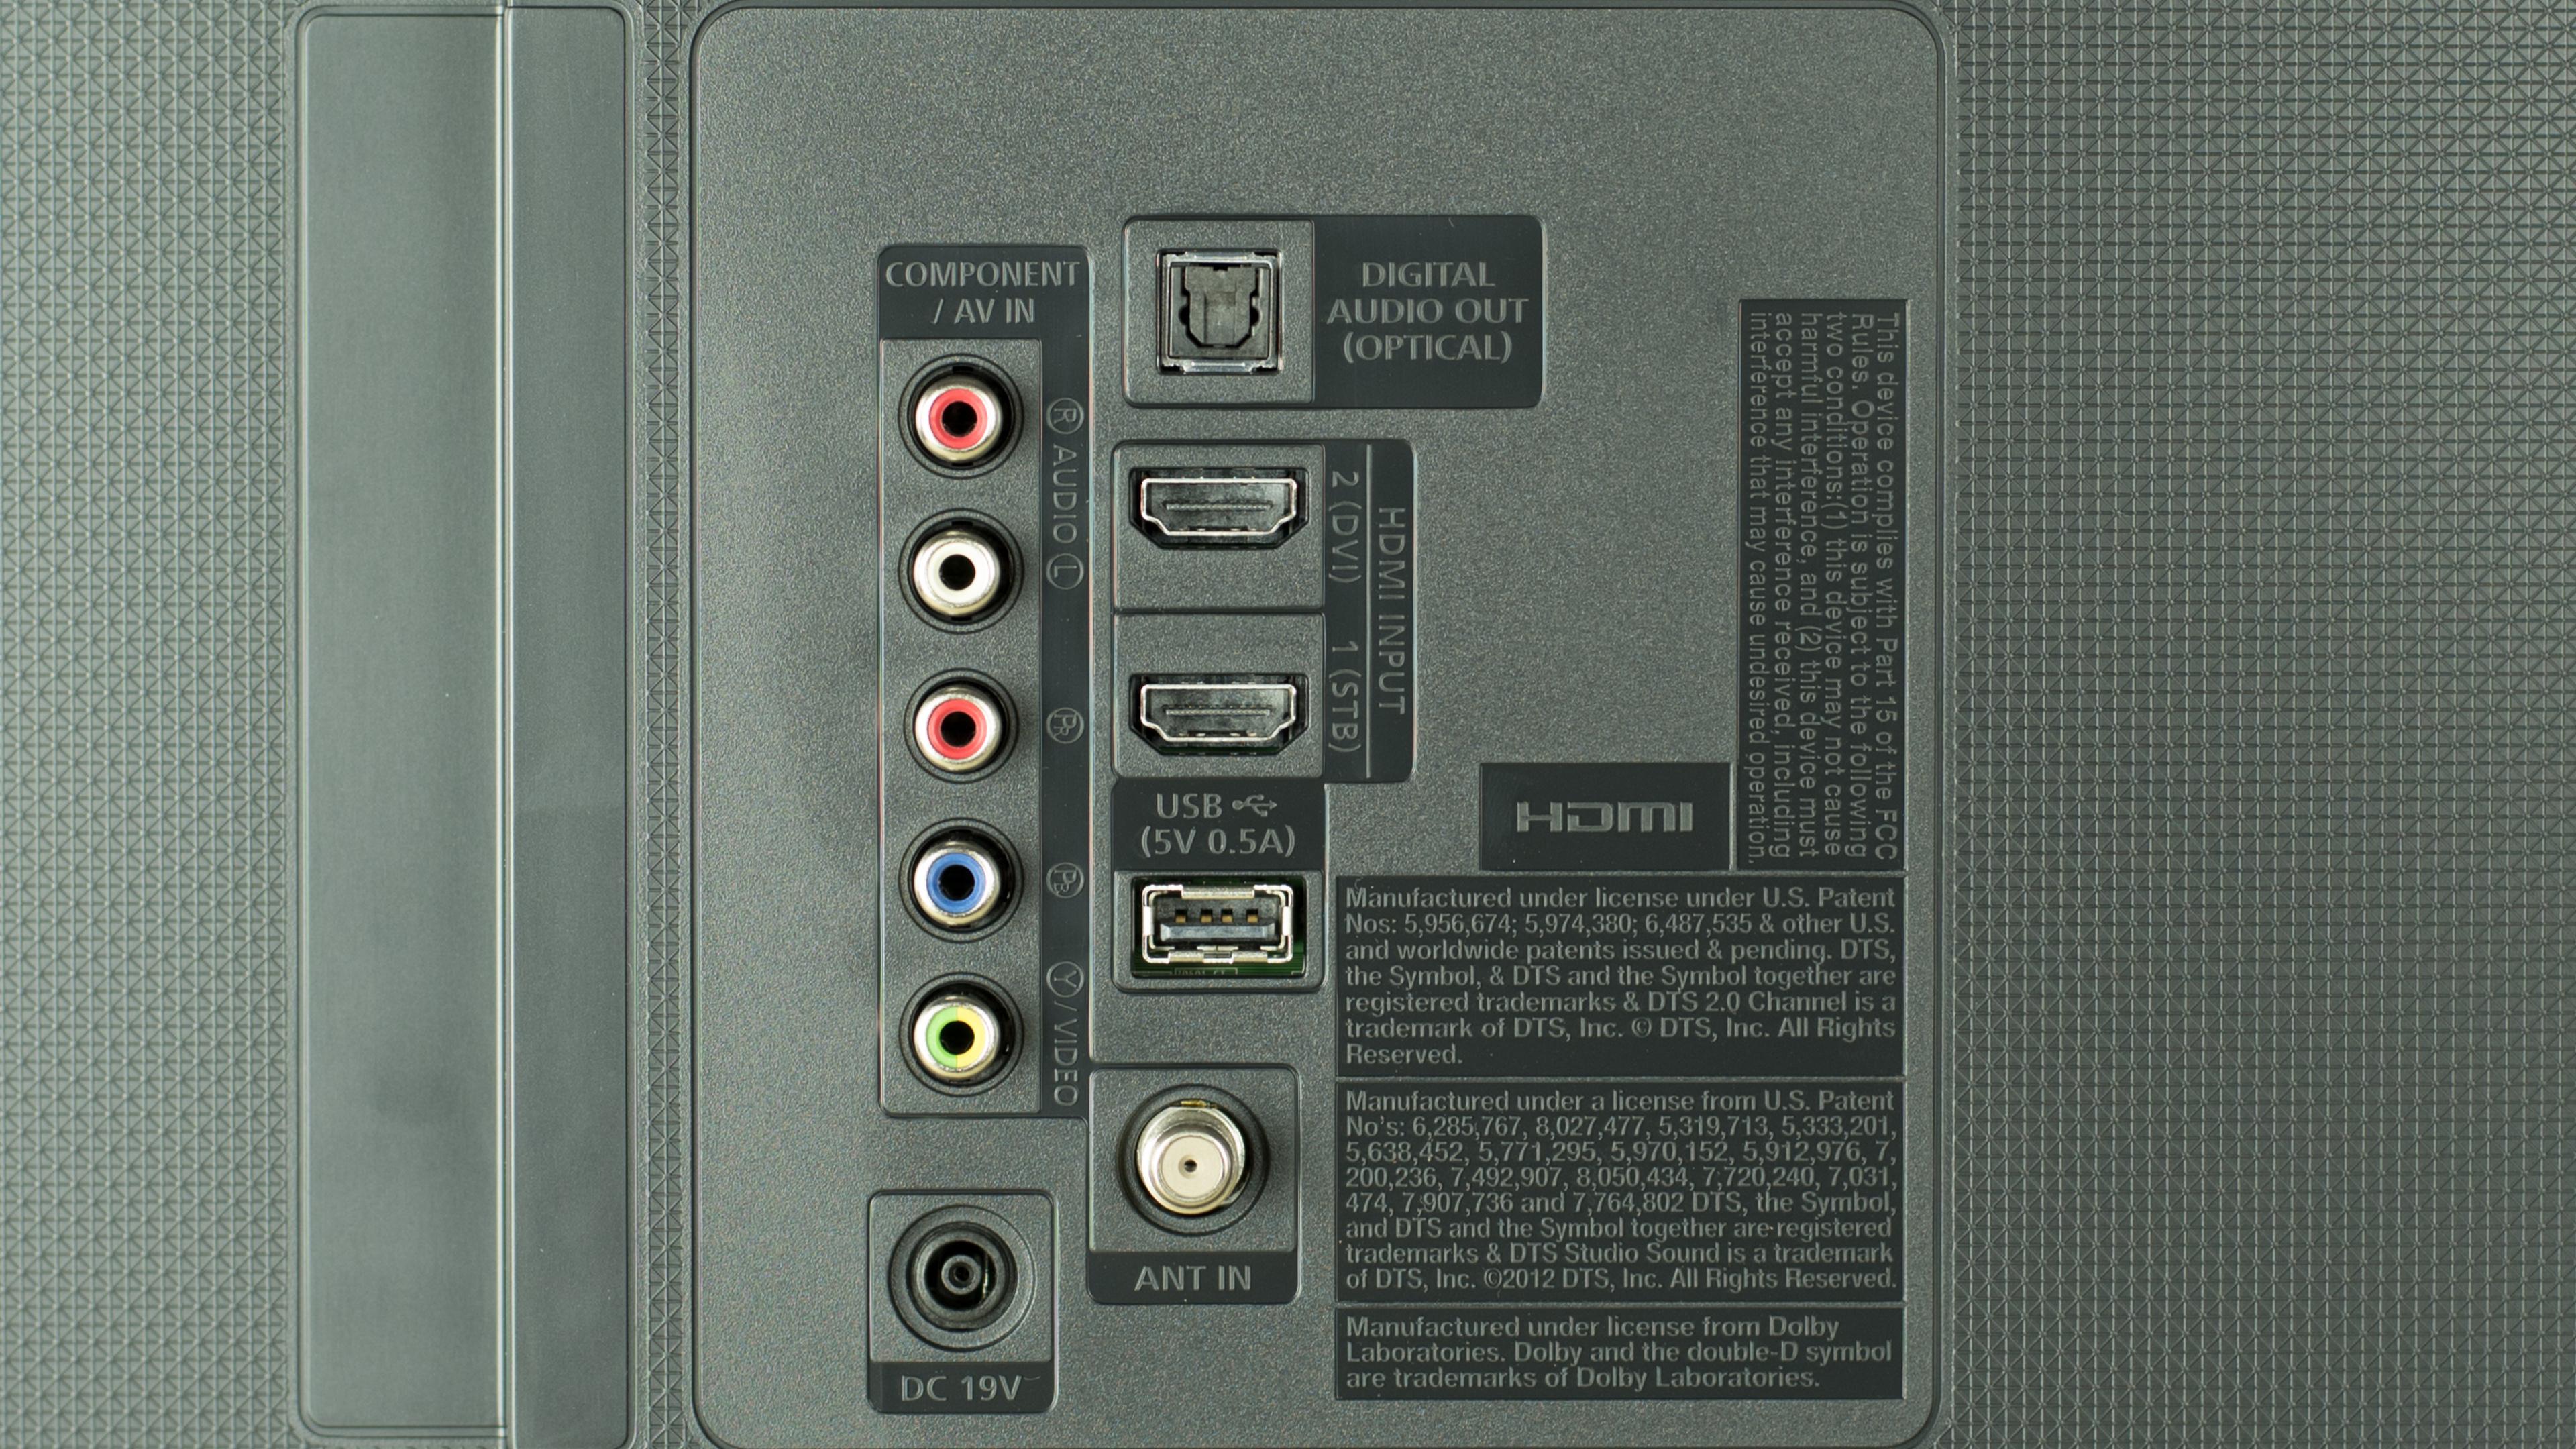 Samsung J4000 Review Un32j4000 Rtings Com